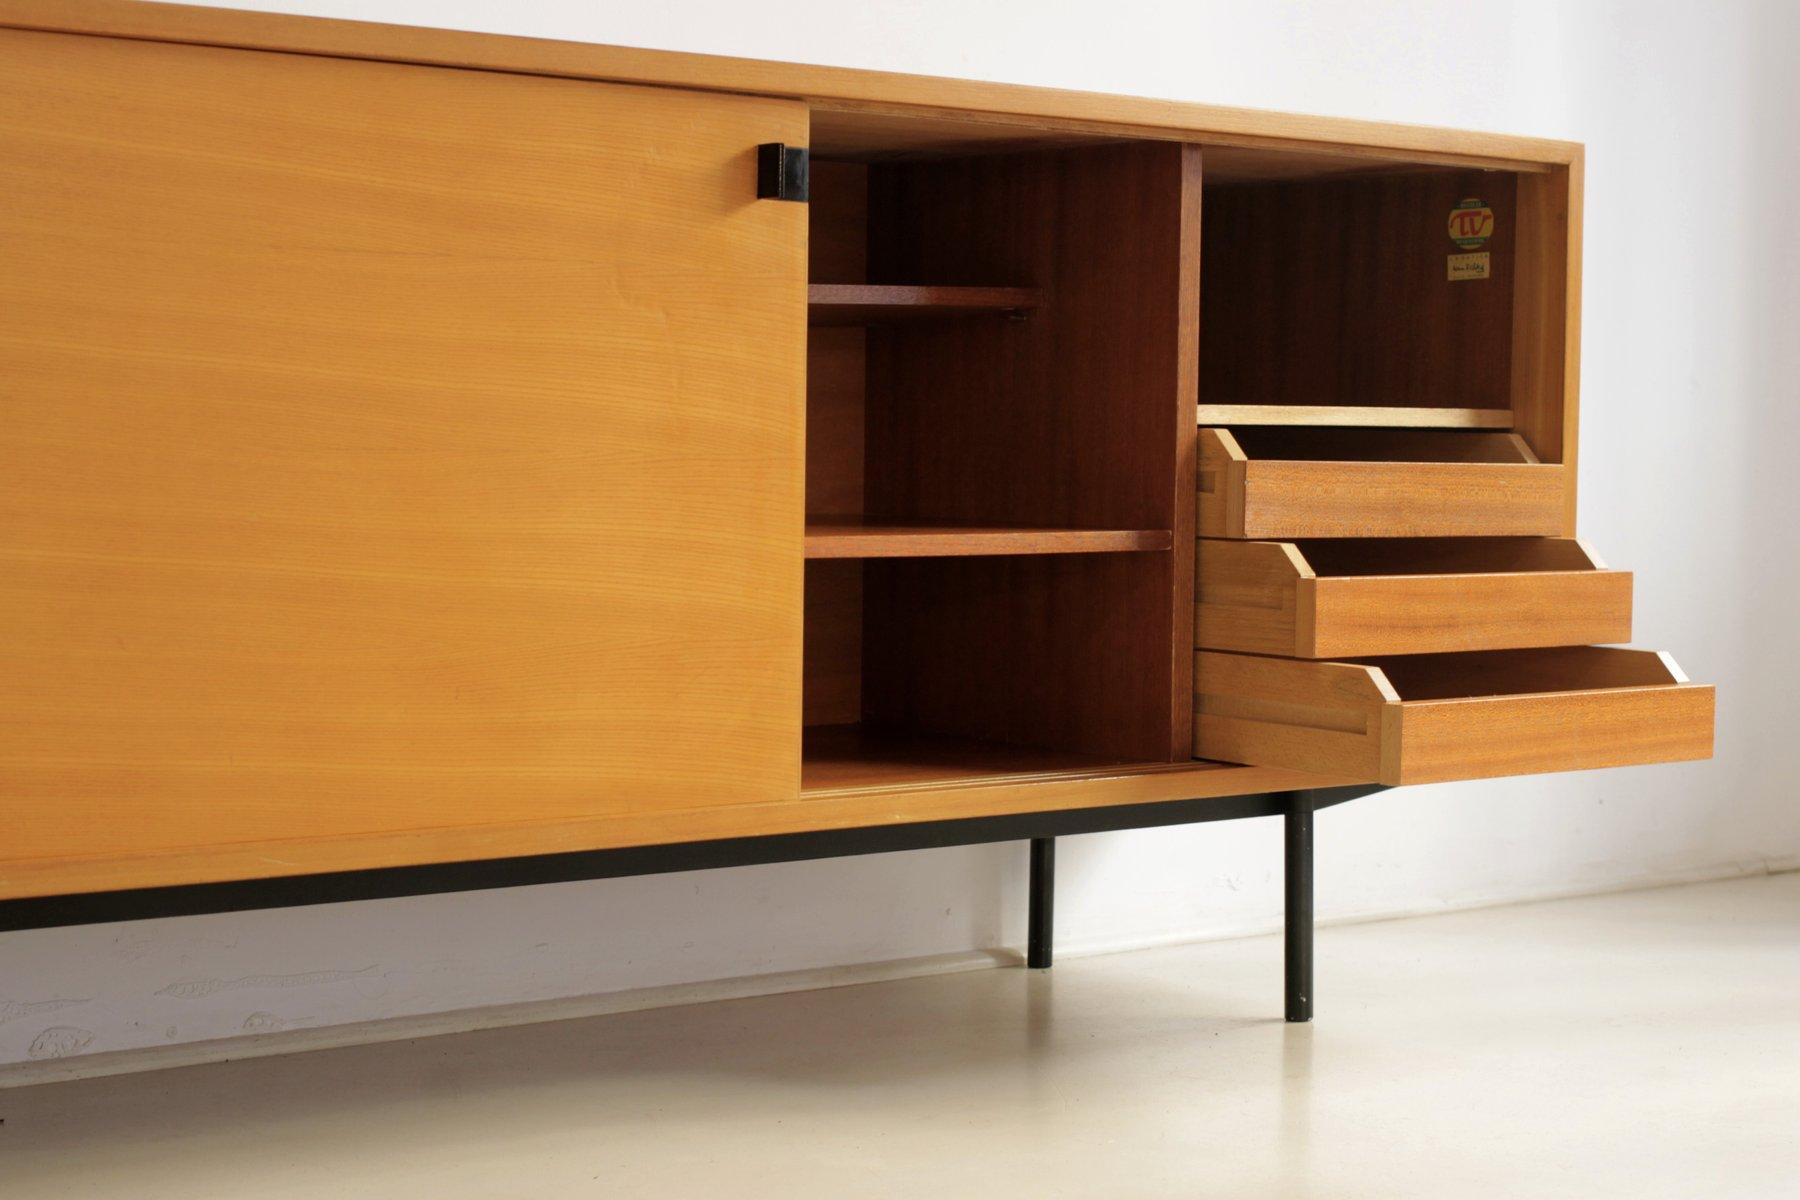 French sideboard by alain richard for meubles tv 1953 for for Meuble tv italien